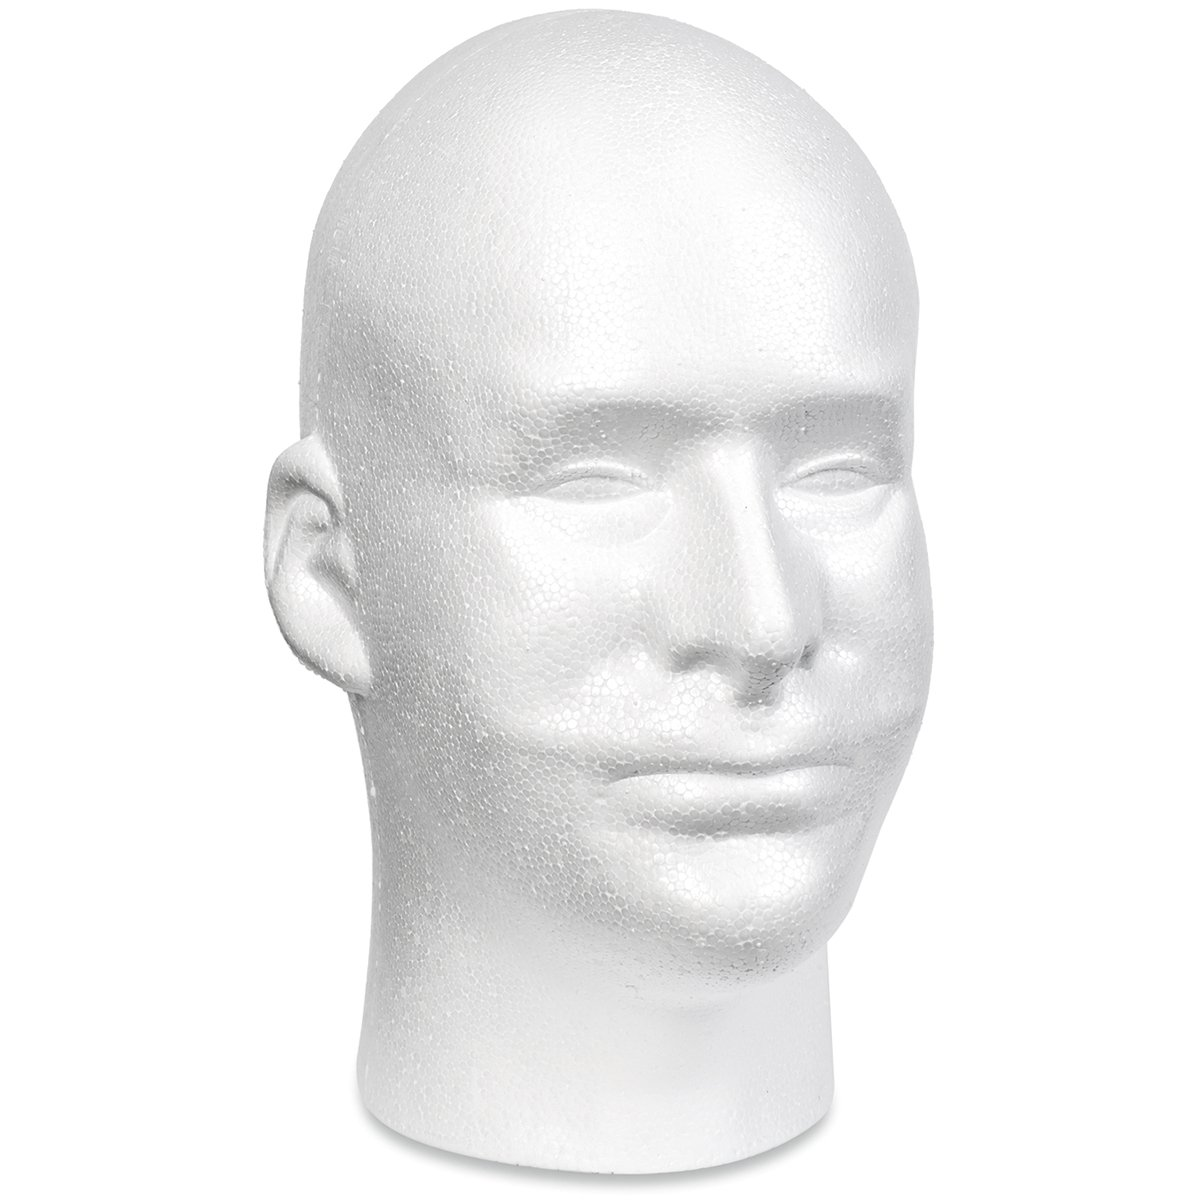 Floracraft Styrofoam Male Head Bulk-11-inch x 6.5-inch x 8.5-inch, Other, Multicoloured Notions Marketing RS261